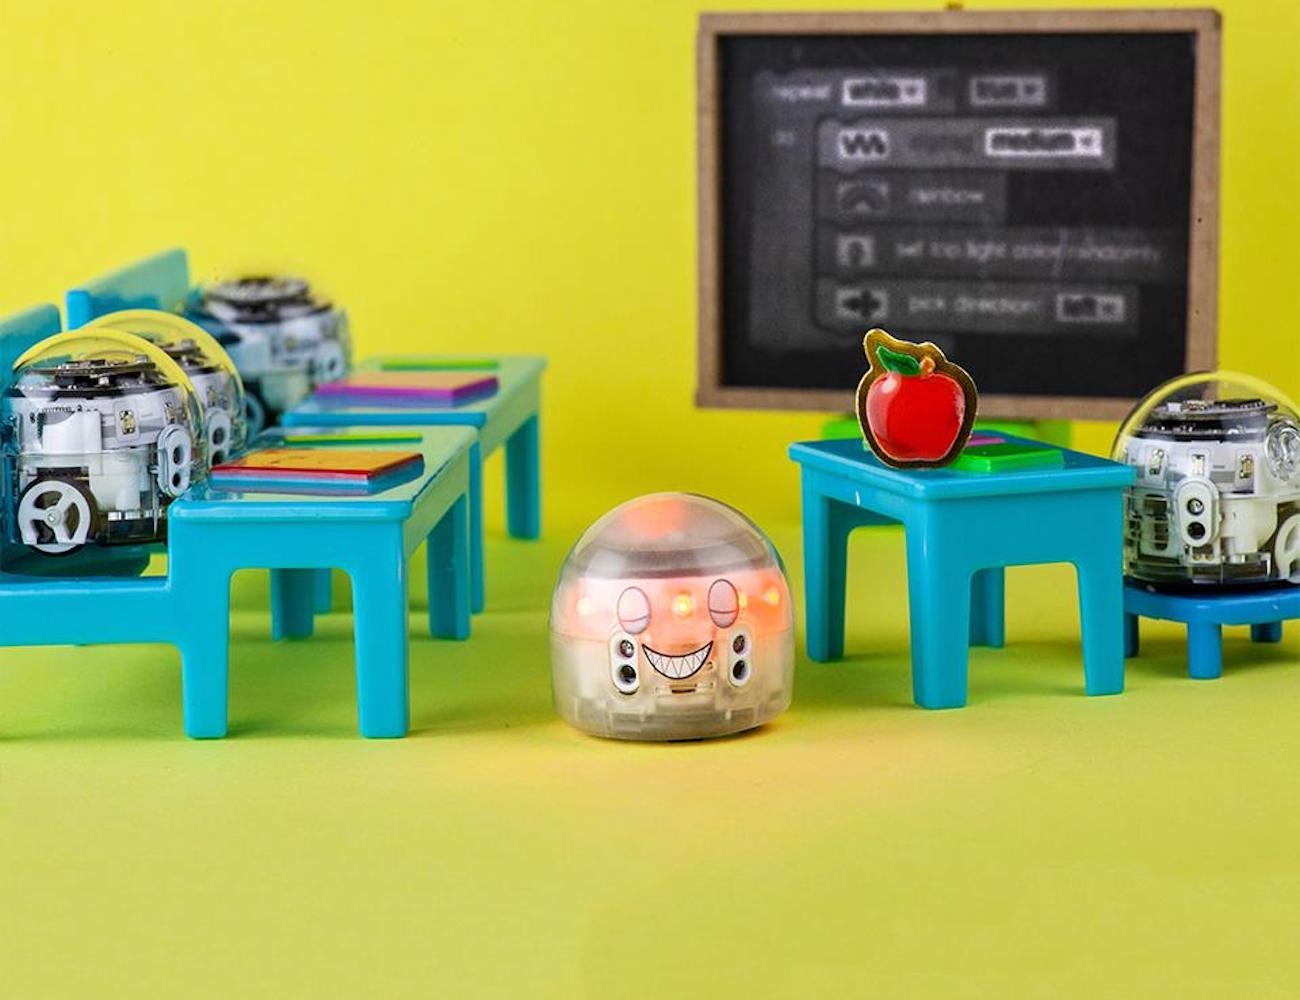 Ozobot Robot Educator Entry Kits